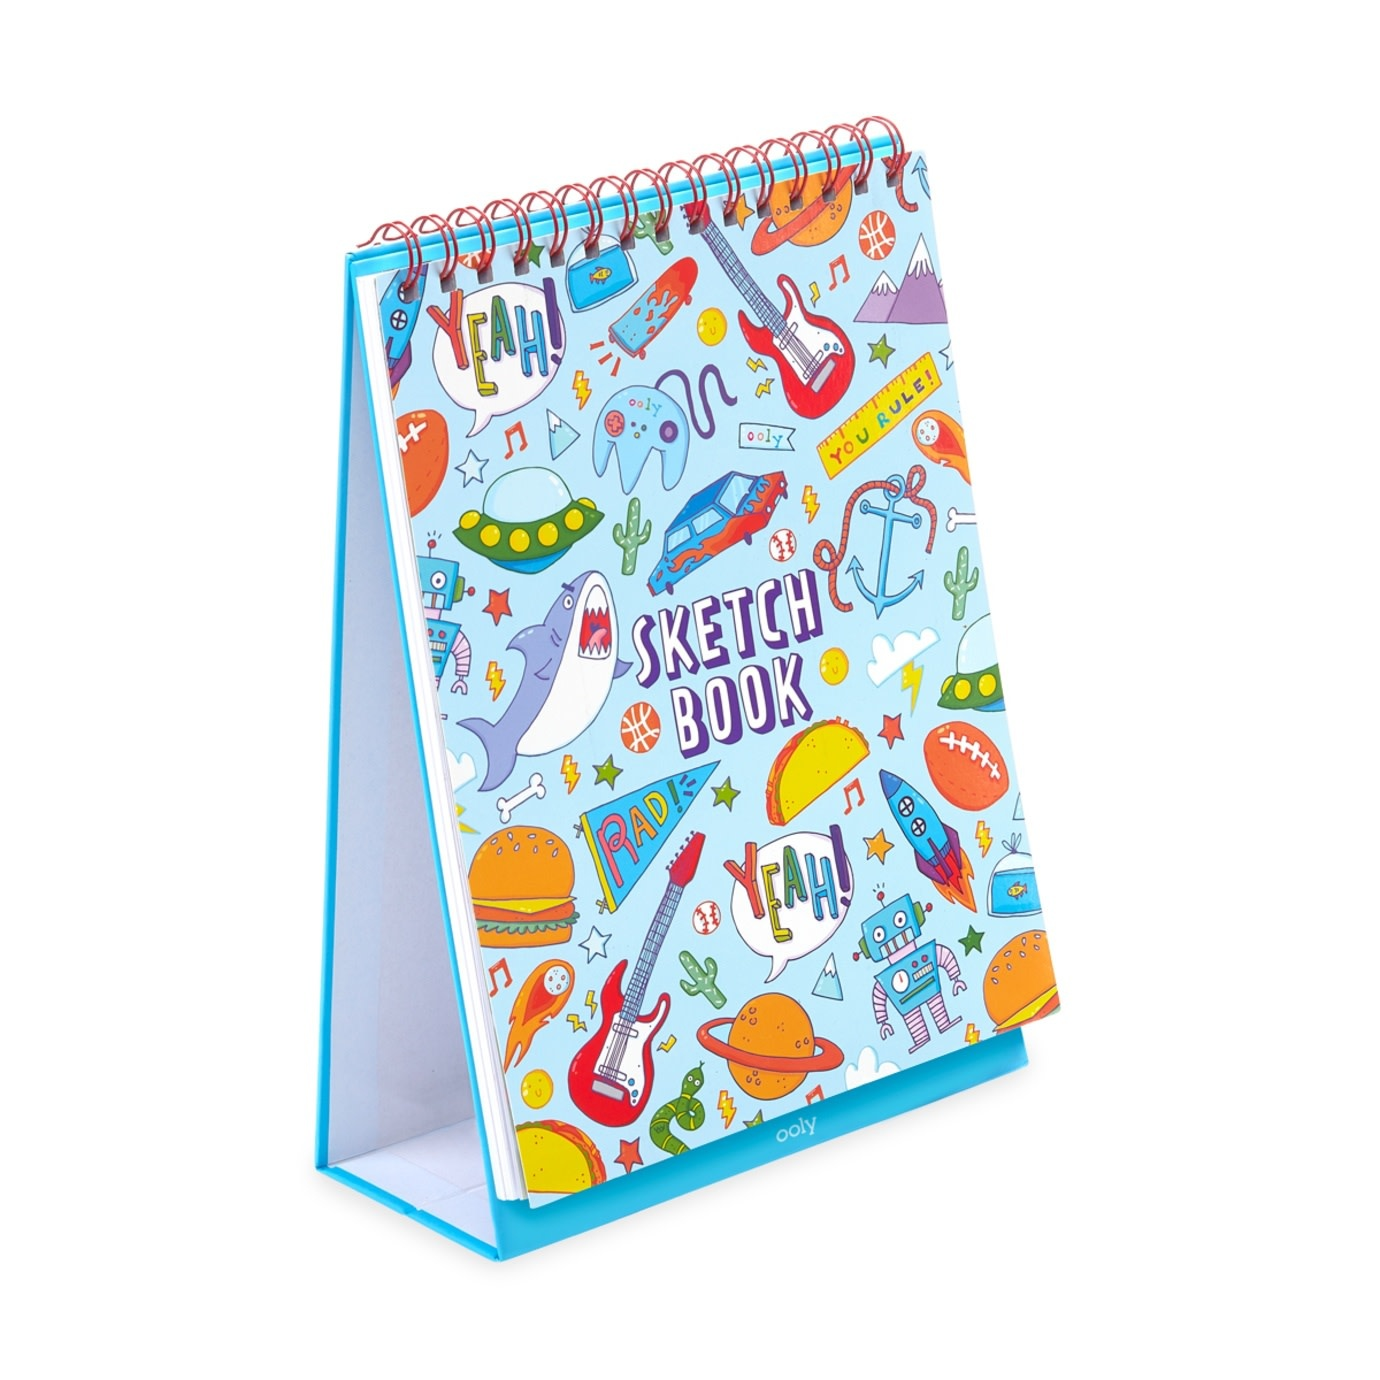 Ooly Ooly standing sketchbook - Awesome doodles